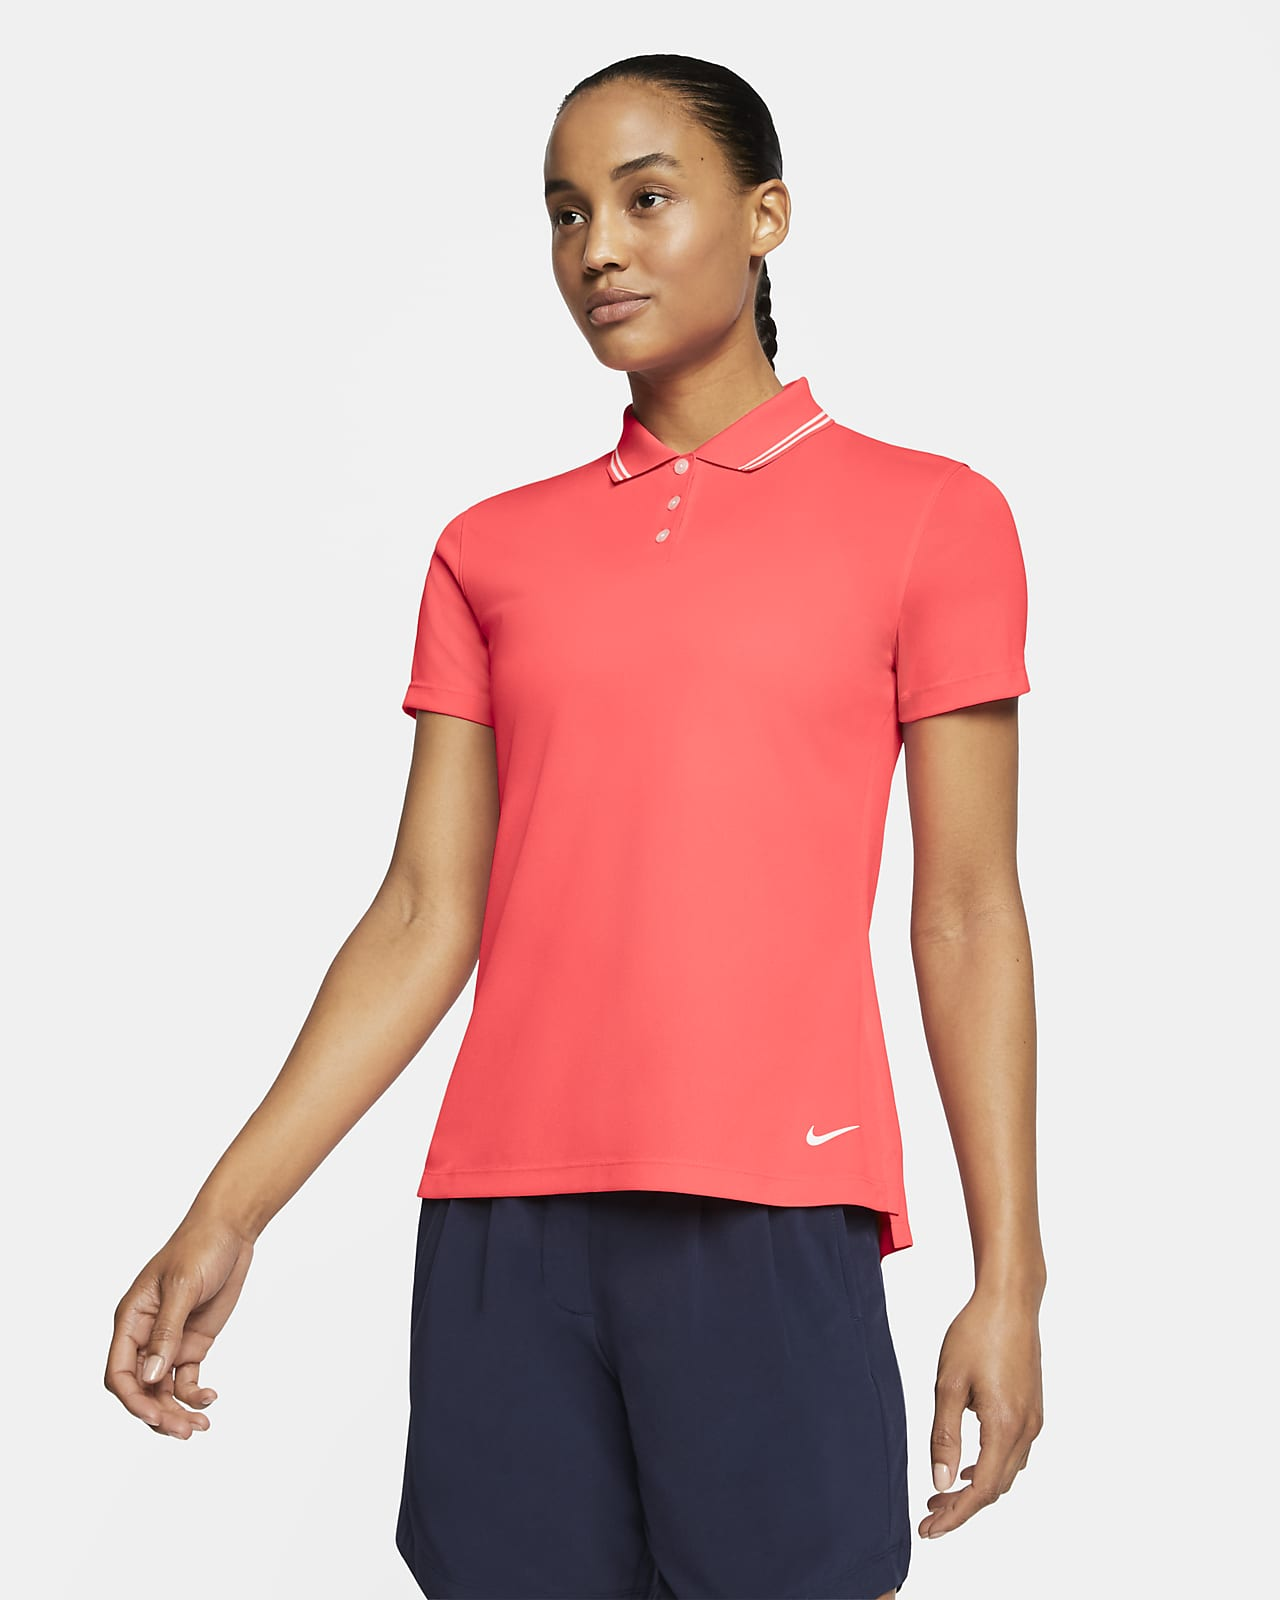 Nike Dri-FIT Victory Golf-Poloshirt für Damen